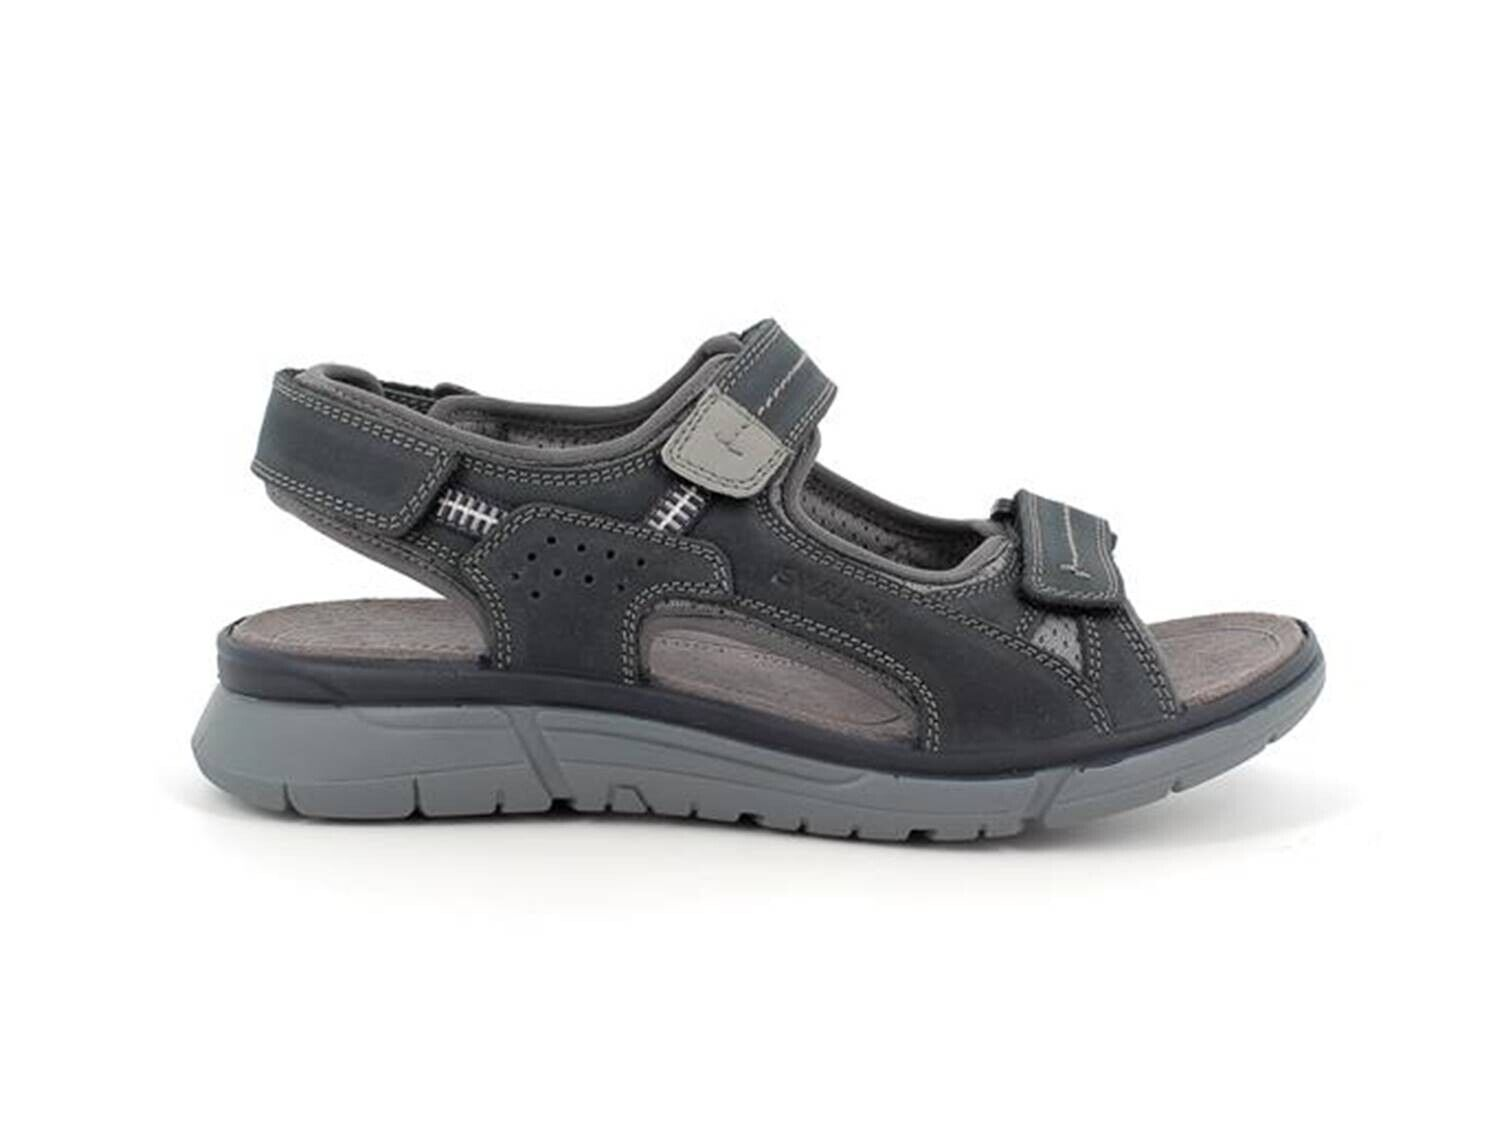 ENVAL SOFT 7221011 Sandals trekking Leather Soft Man Memory